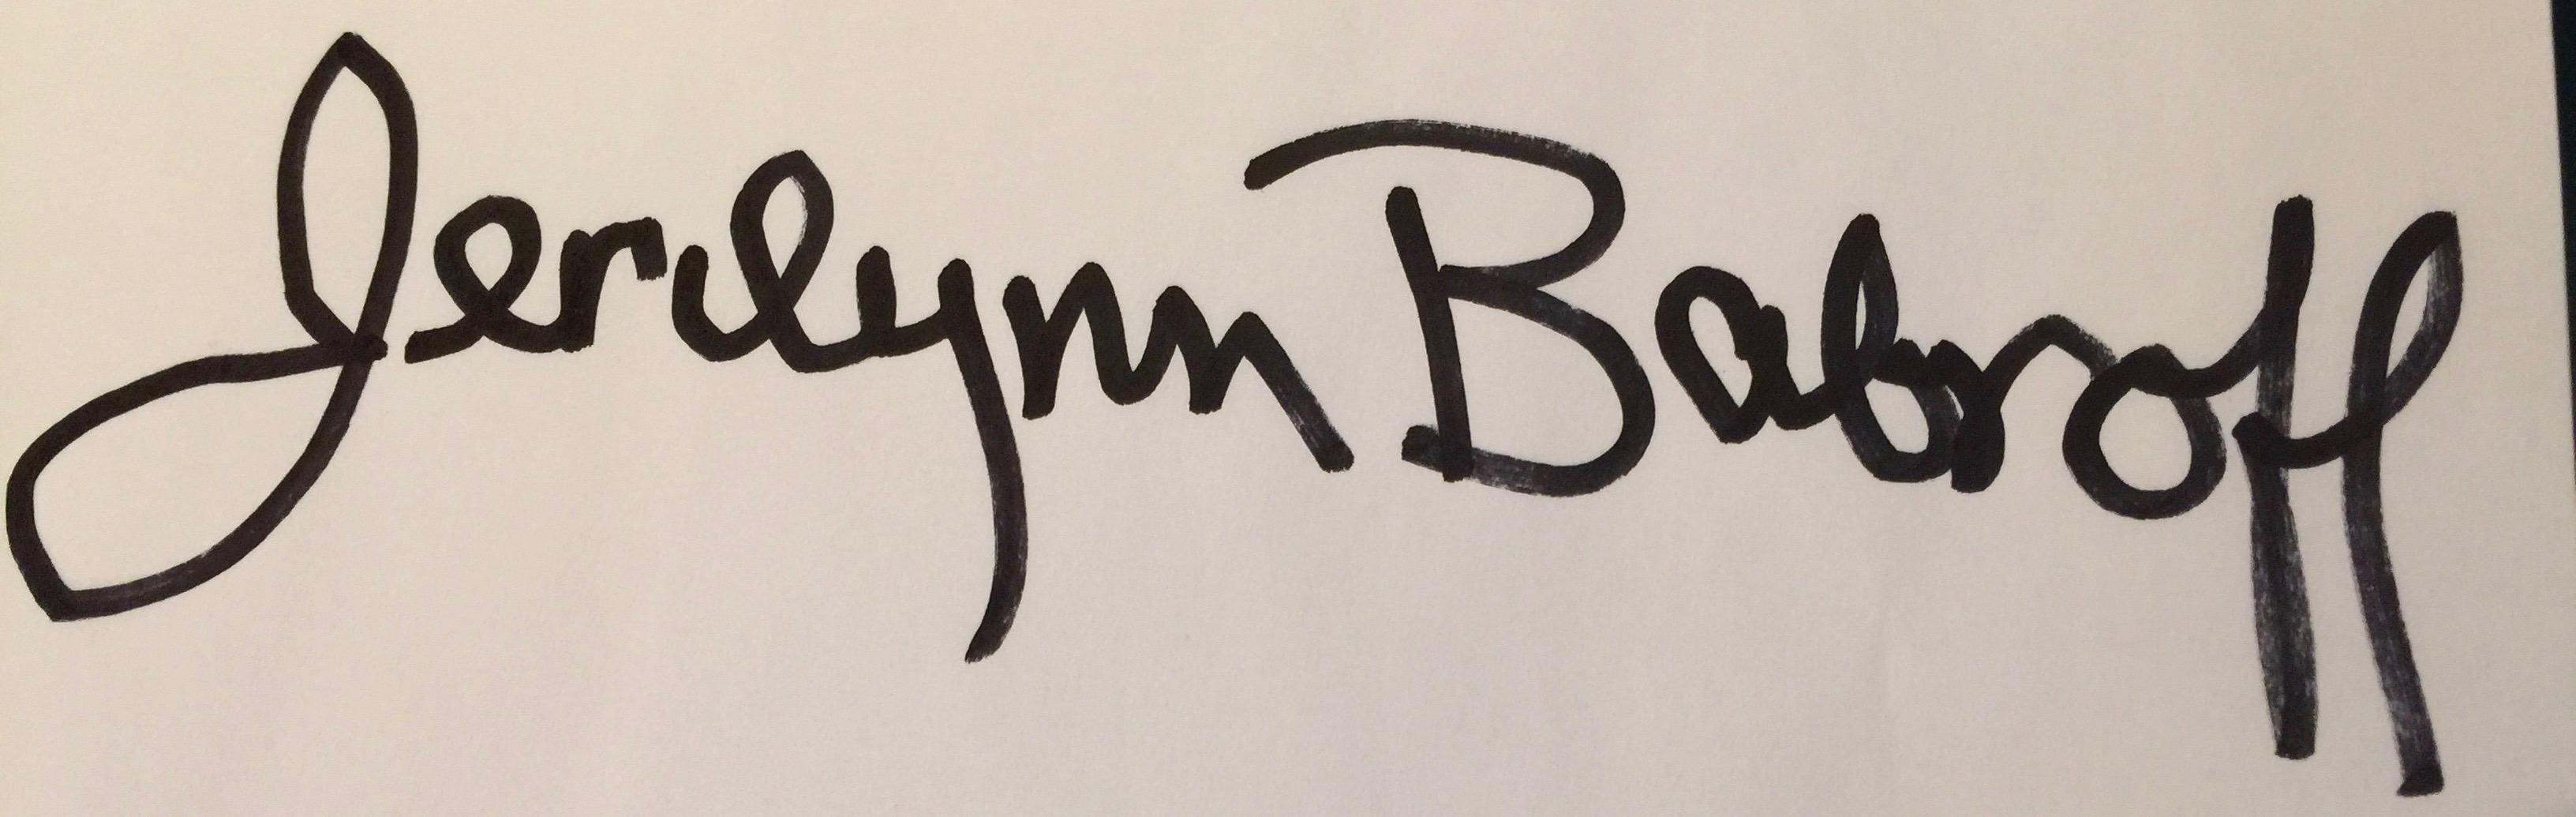 Jerilynn Babroff's Signature